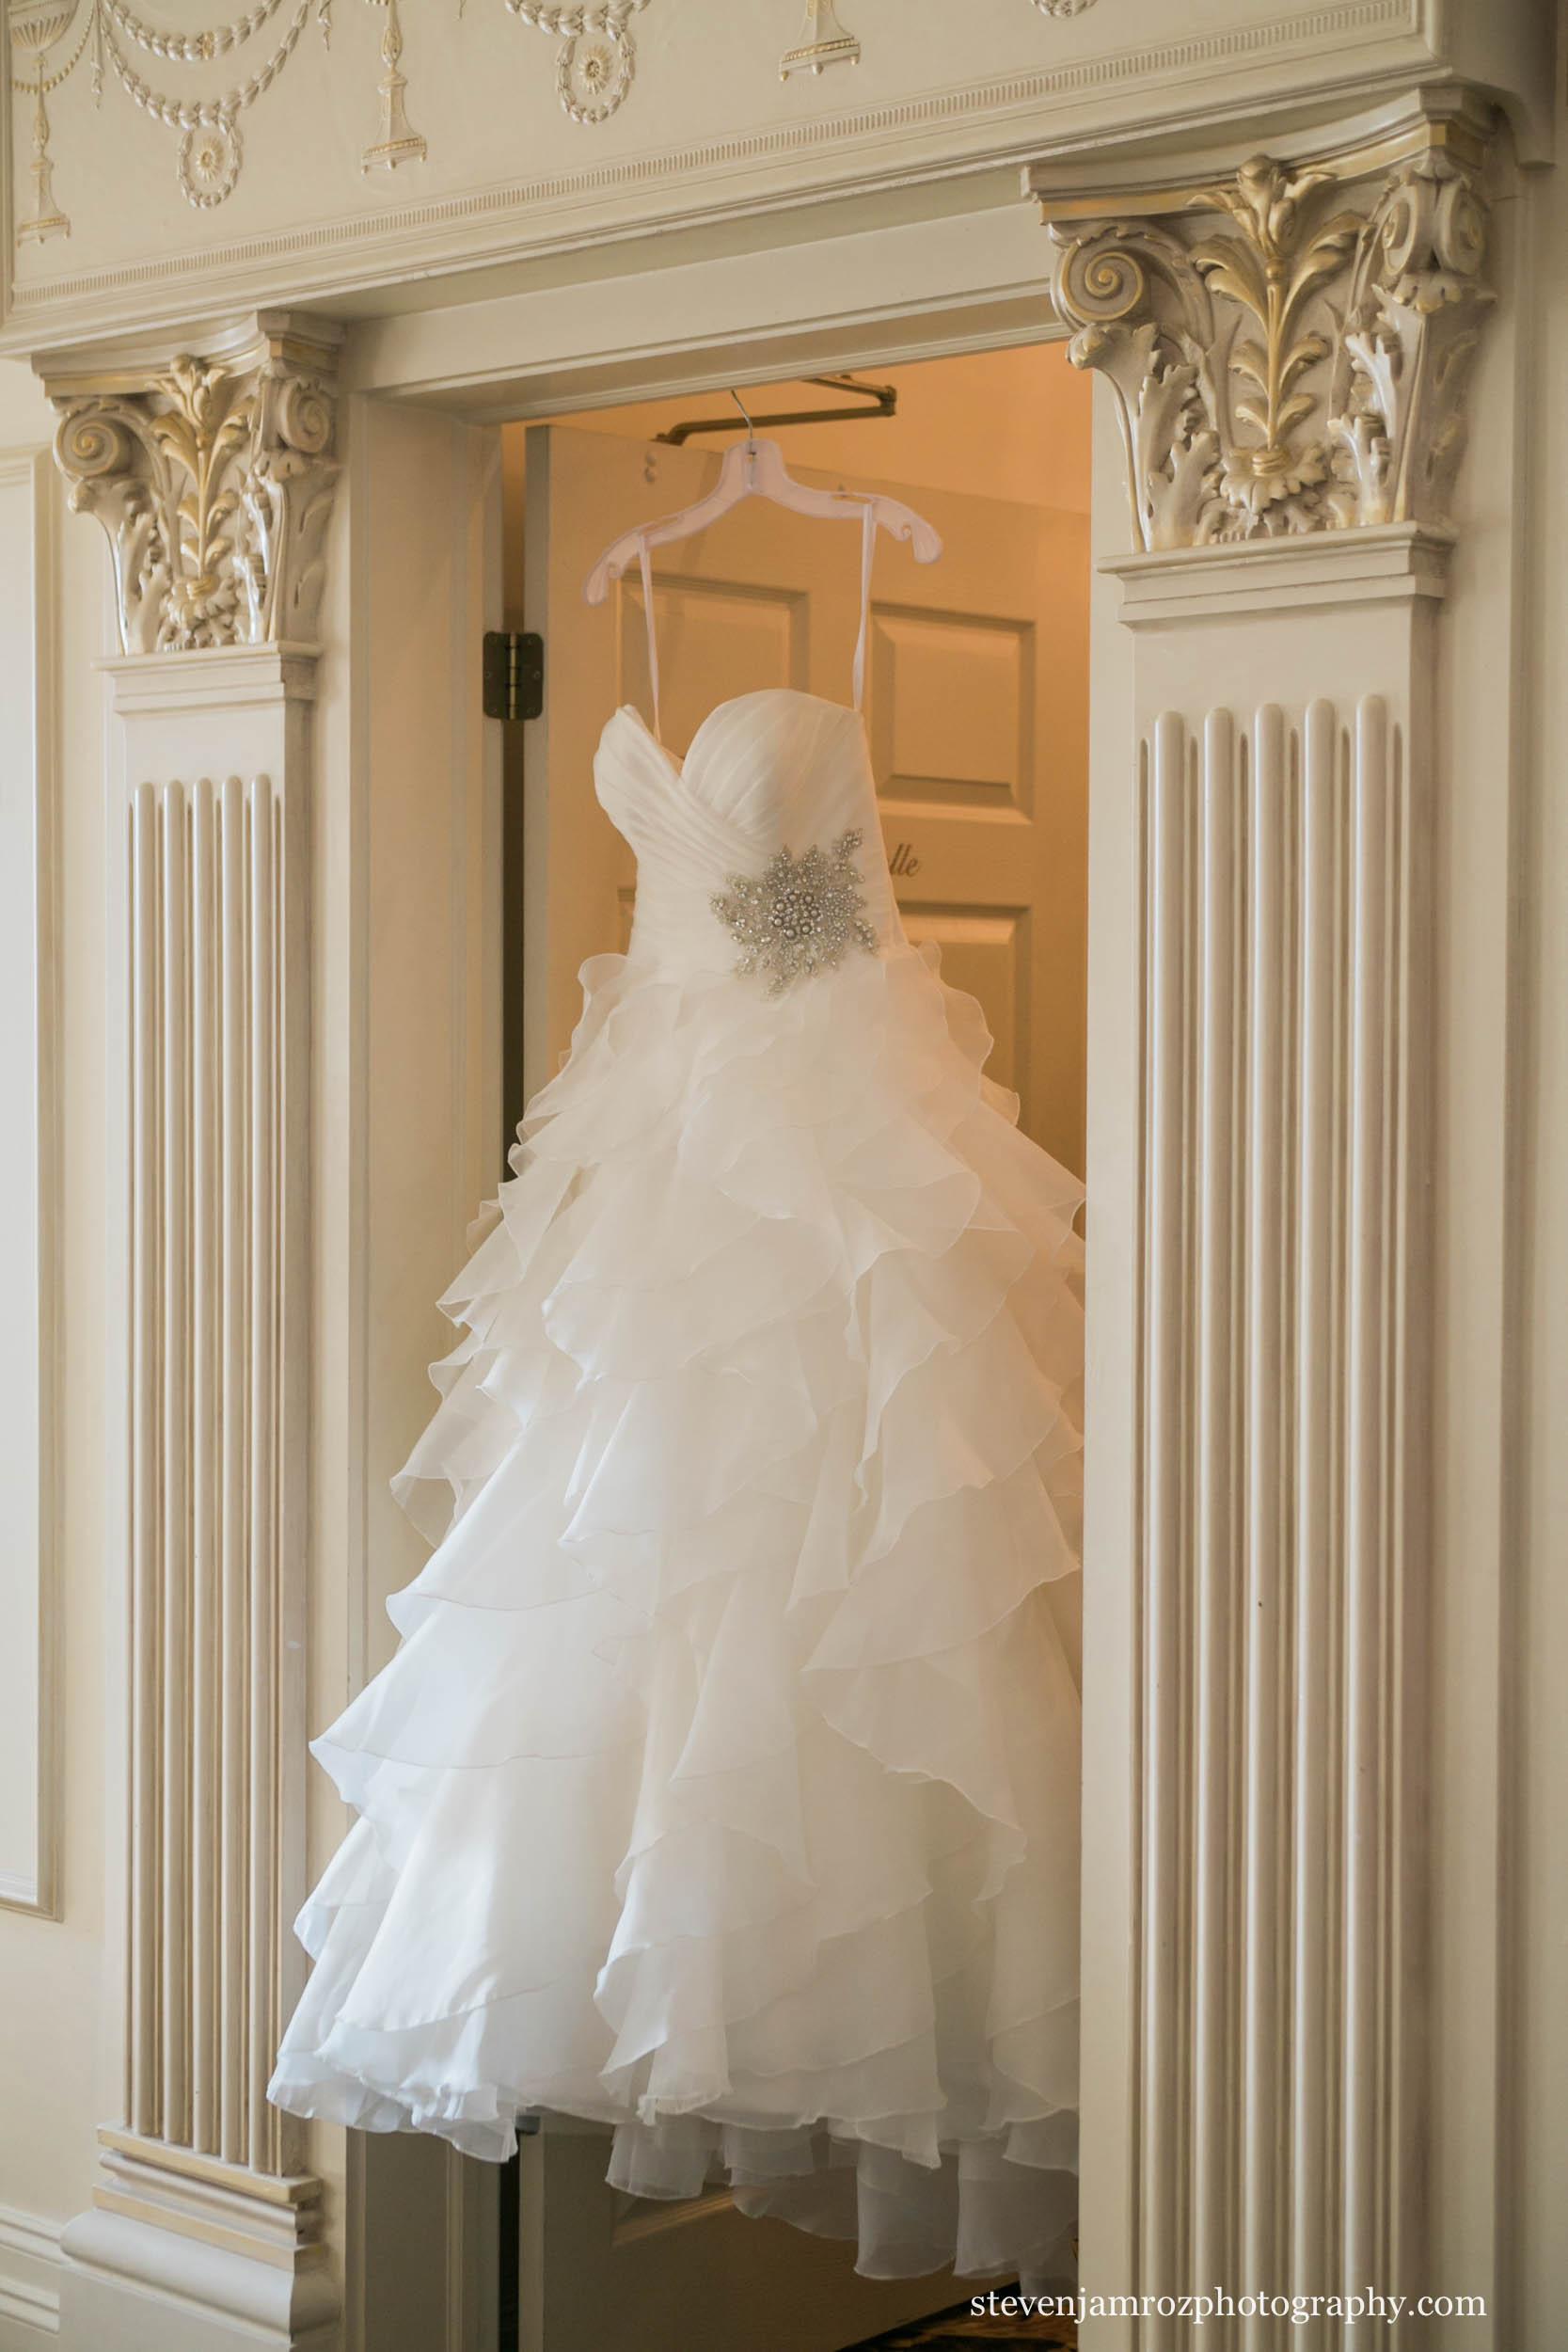 hanging-dress-hall-at-landmark-steven-jamroz-photography-0299.jpg